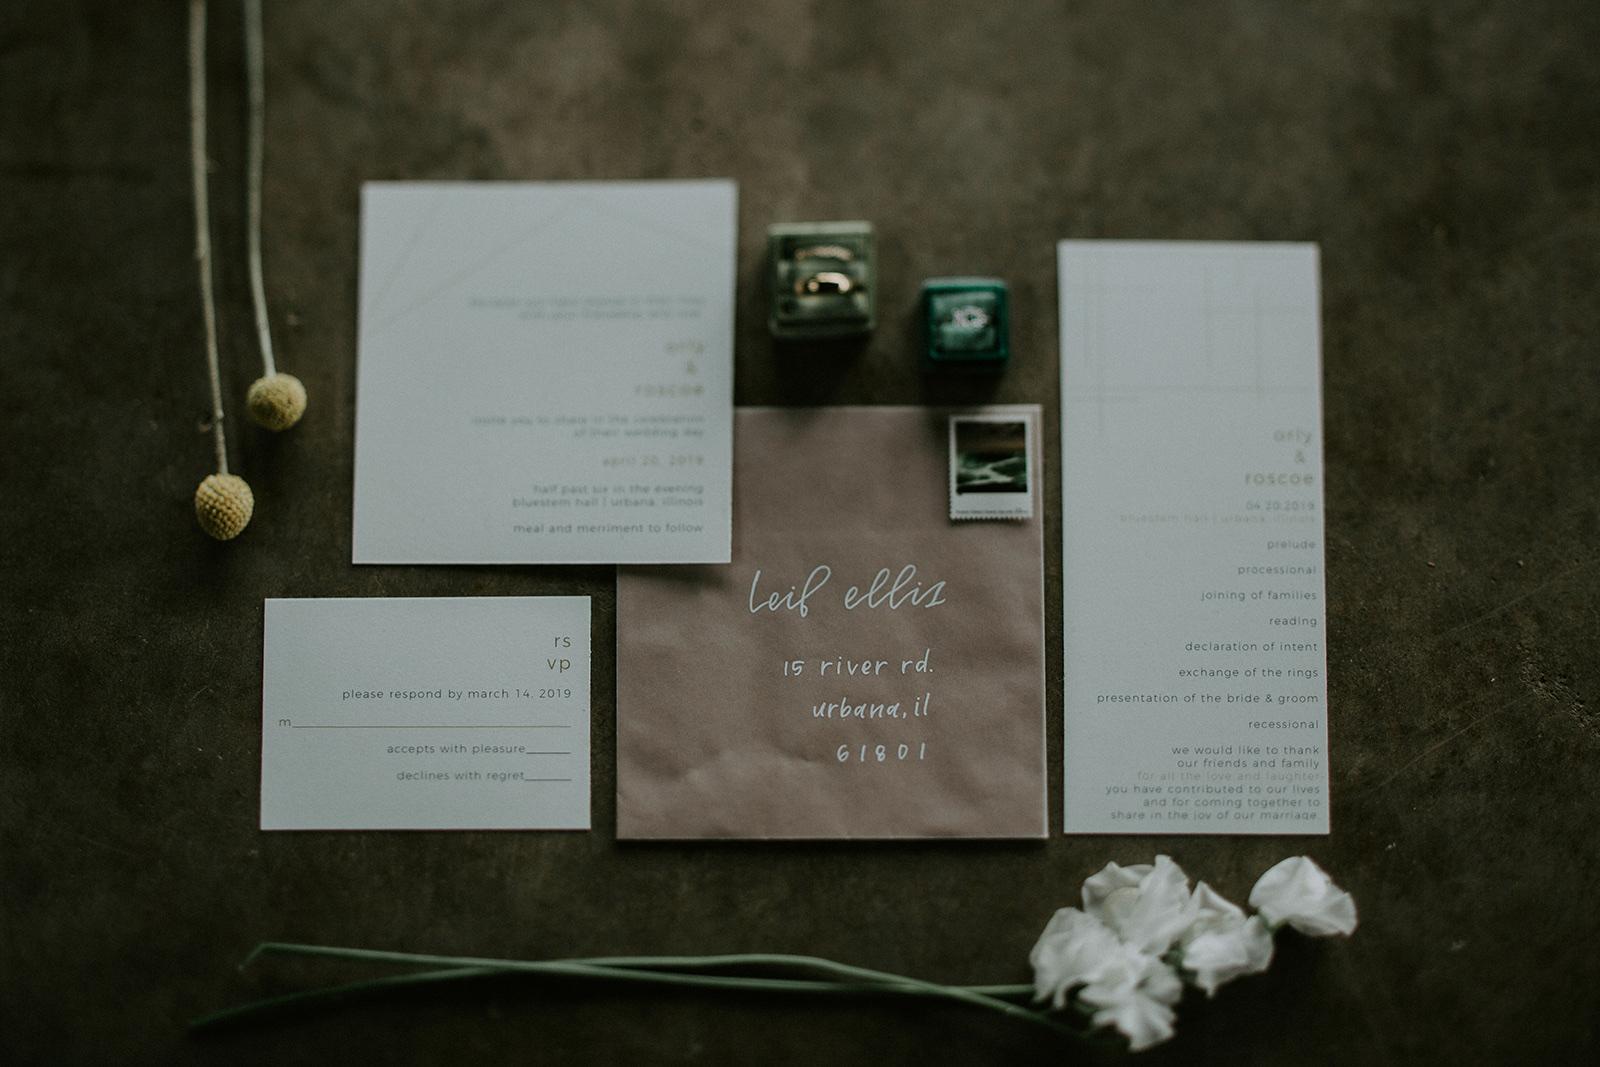 bluestem_hall_champaign_wedding_photographer_wright_photographs_collaboration_0059.jpg